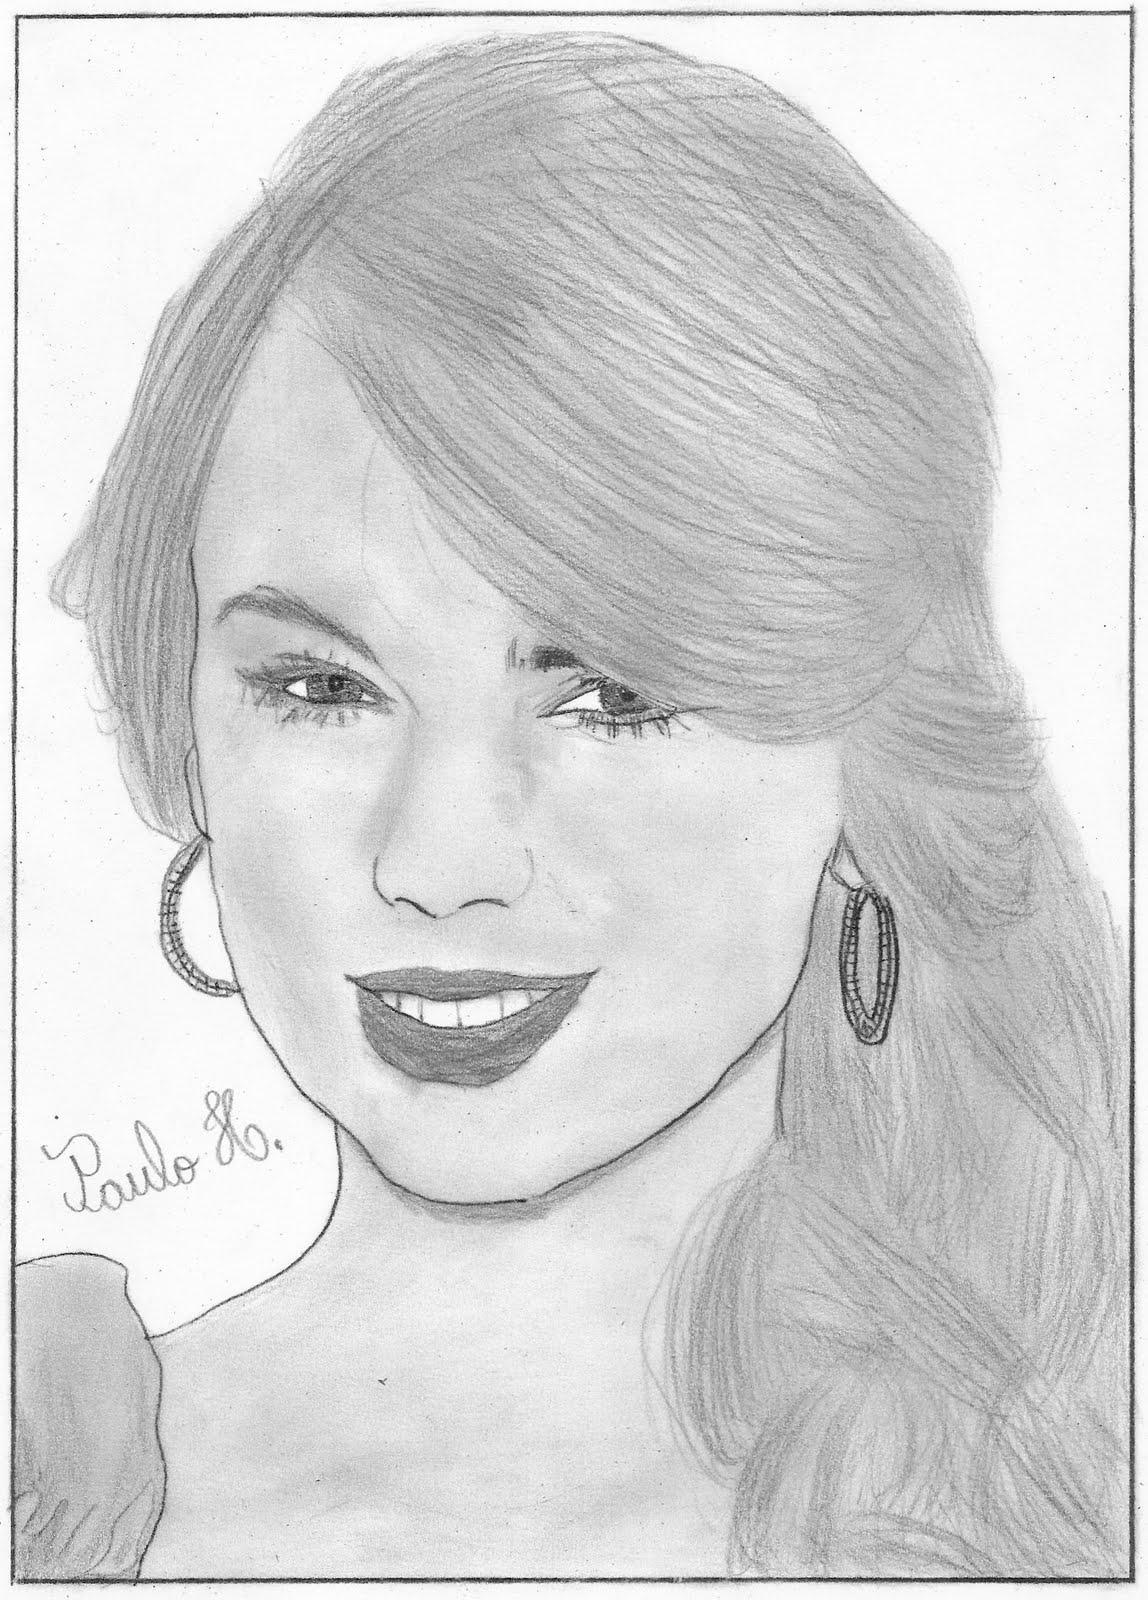 http://2.bp.blogspot.com/-LAYuh4xQj-s/TjvbFPWTaEI/AAAAAAAAA9U/w0WAos8g1nk/s1600/42+-+Taylor+Swift.jpg